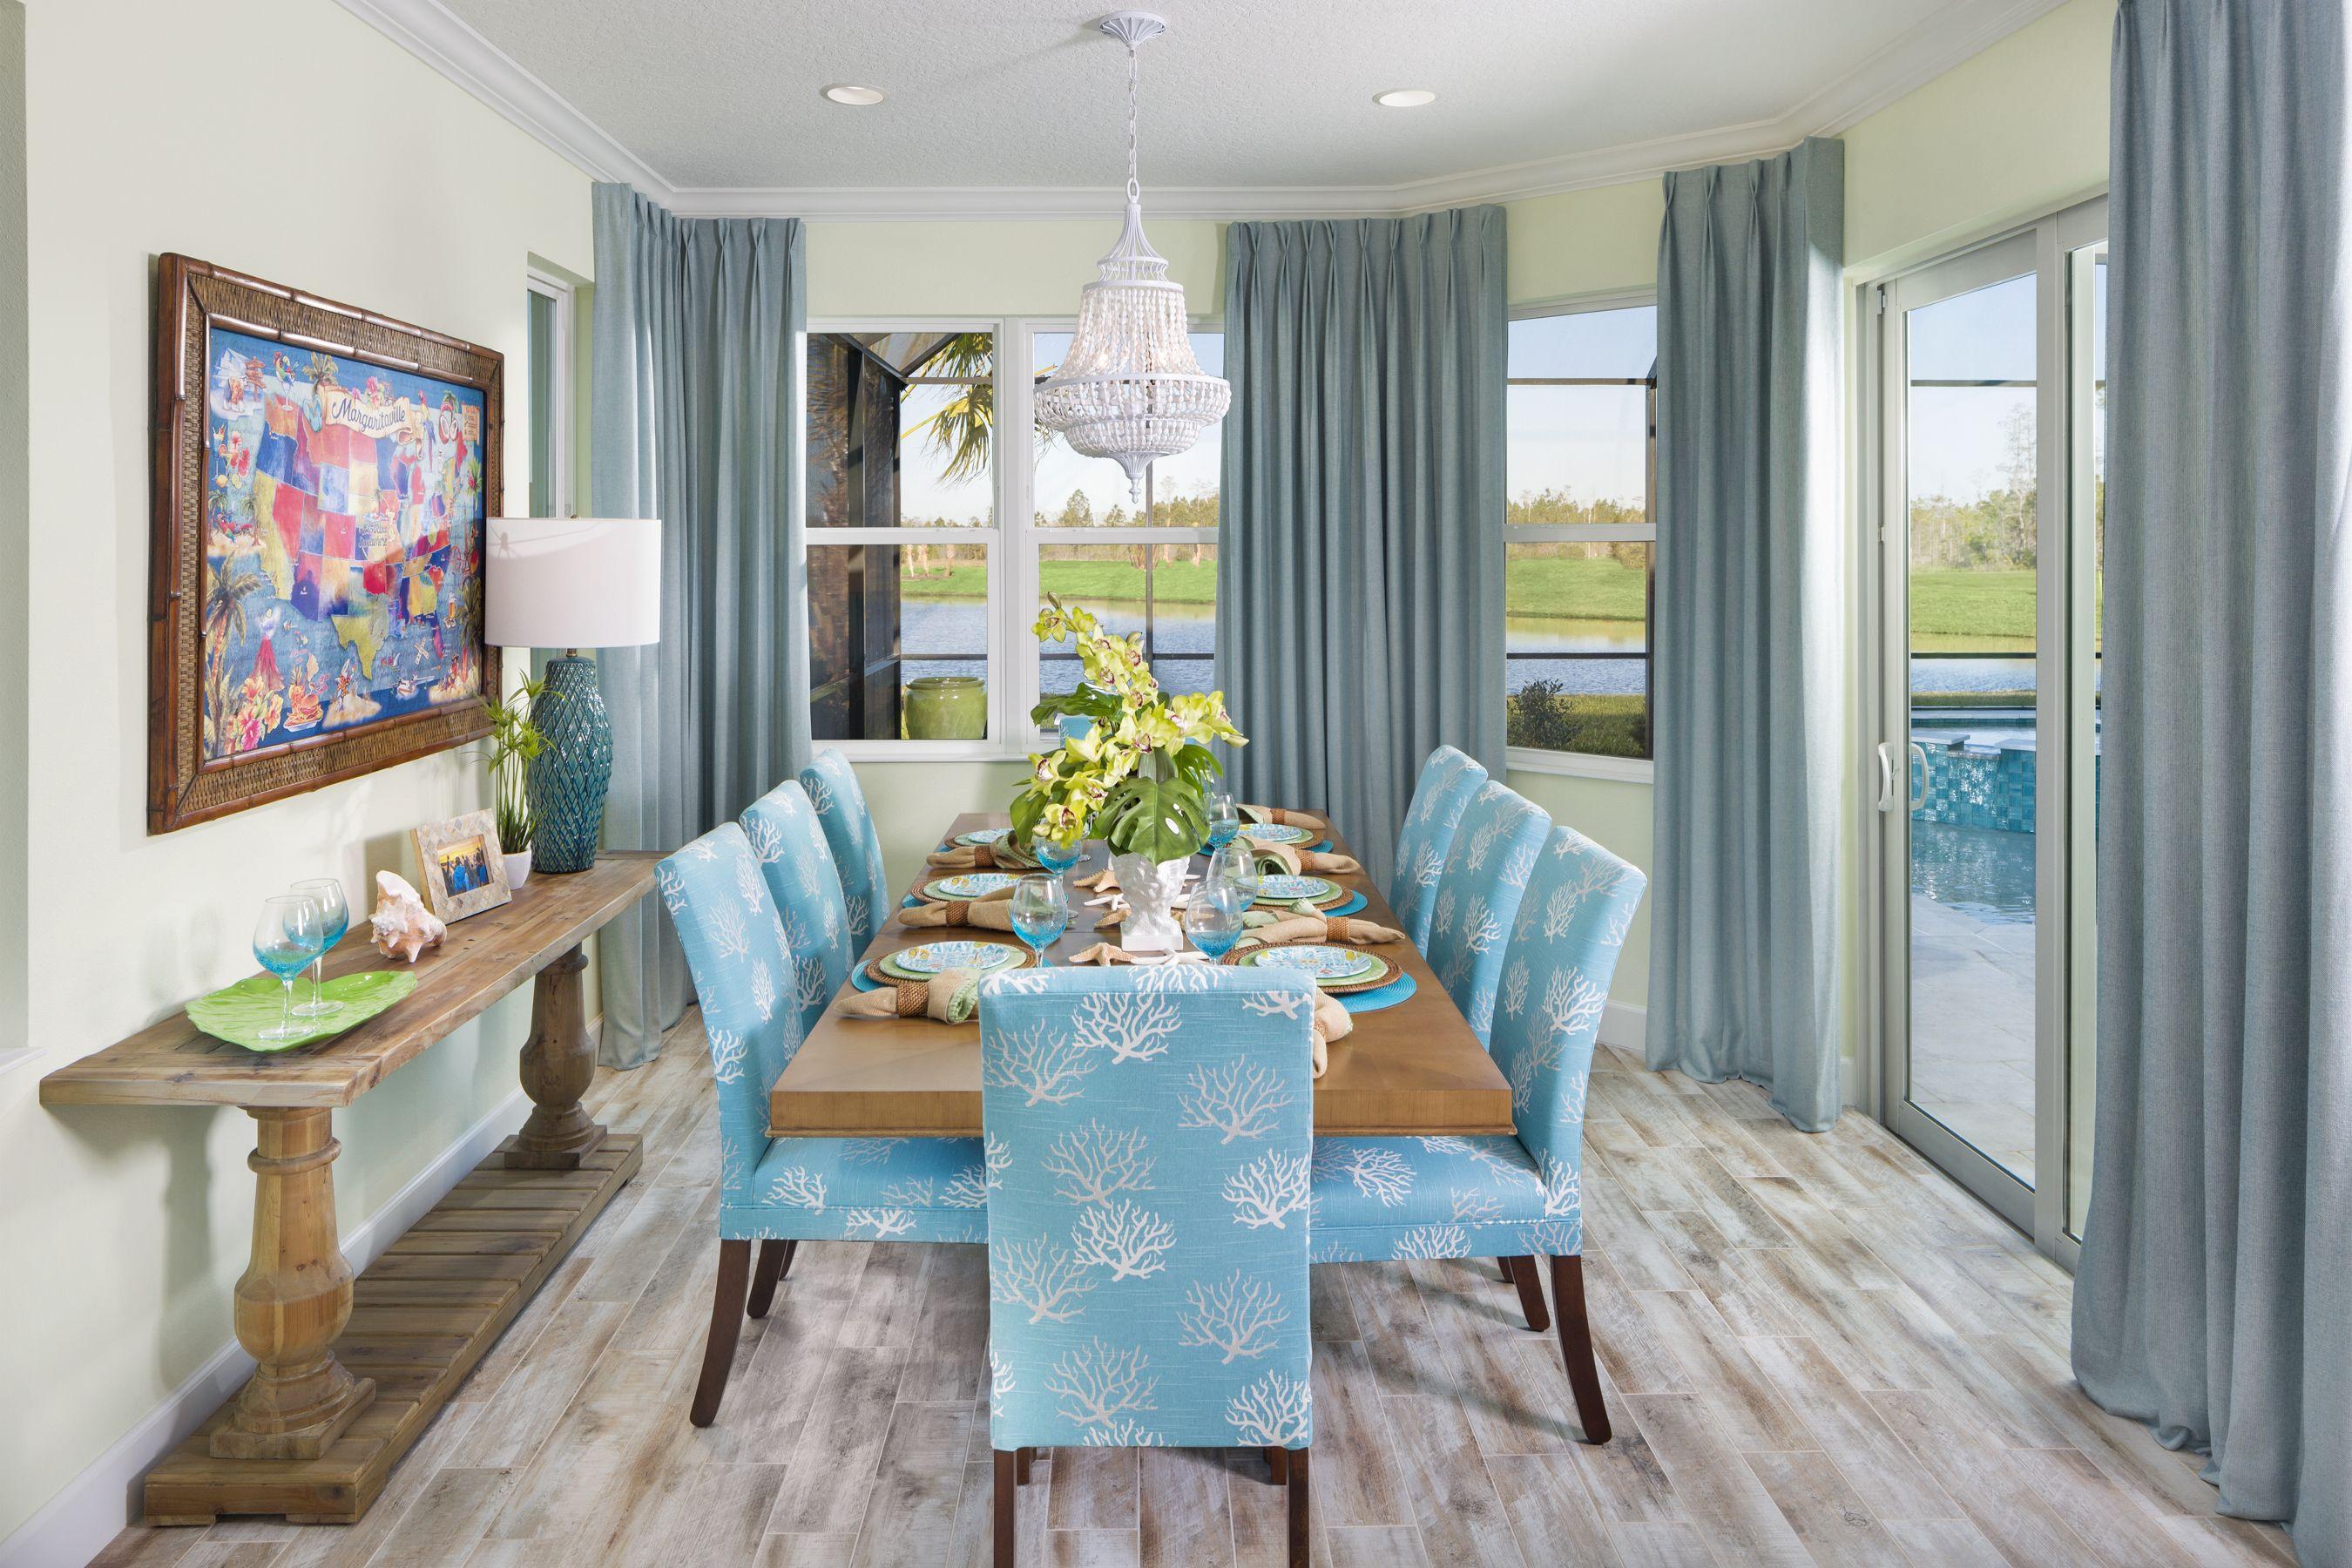 Aruba Model At Latitude Margaritaville Daytona Beach Minto Communities Coastal Dining Room Coastal Bedrooms Coastal Dining Room Decor